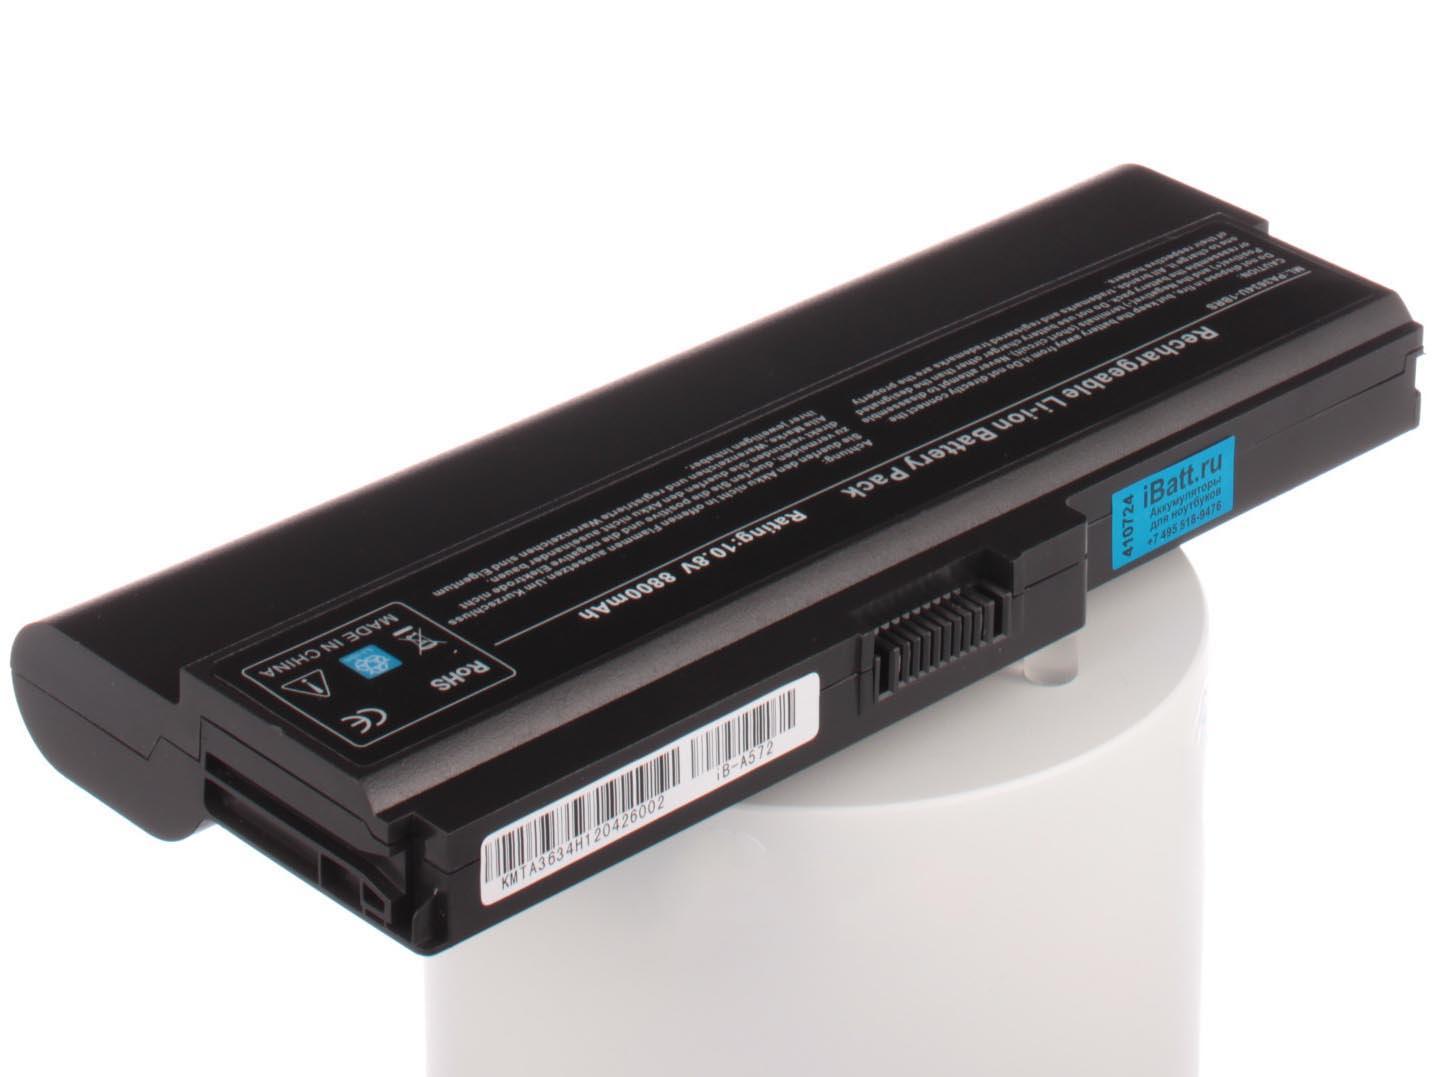 Аккумулятор для ноутбука iBatt для ToshiBa Satellite L670-1H0, Satellite L730-10M, Satellite L750-12G, Satellite PRO C650-135, Satellite PRO L630-140, Satellite PRO L630-141, Satellite C650D-122, Satellite C660D-10W аккумулятор rocknparts для toshiba satellite l750 48wh 10 8v 432092